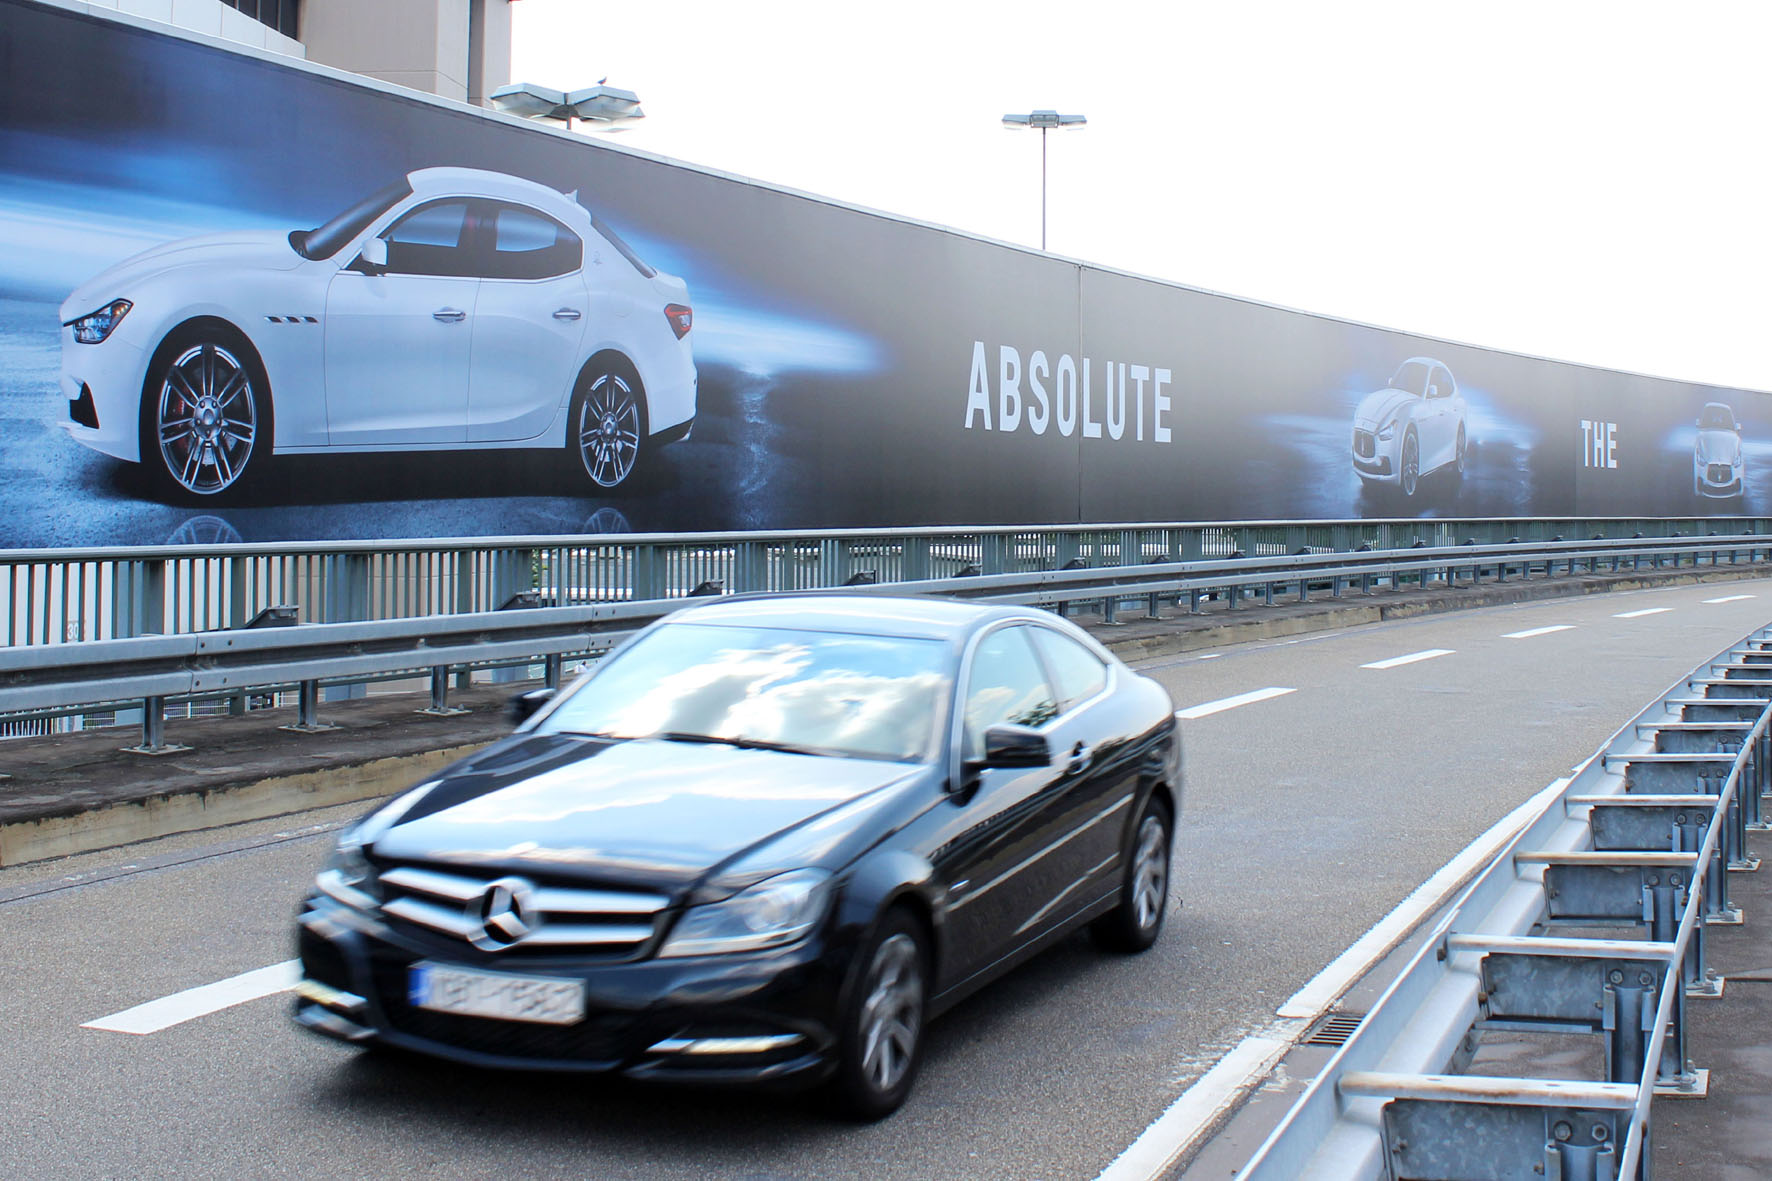 200 Meter langes Ghibli Werbebanner am Frankfurter Flughafen.